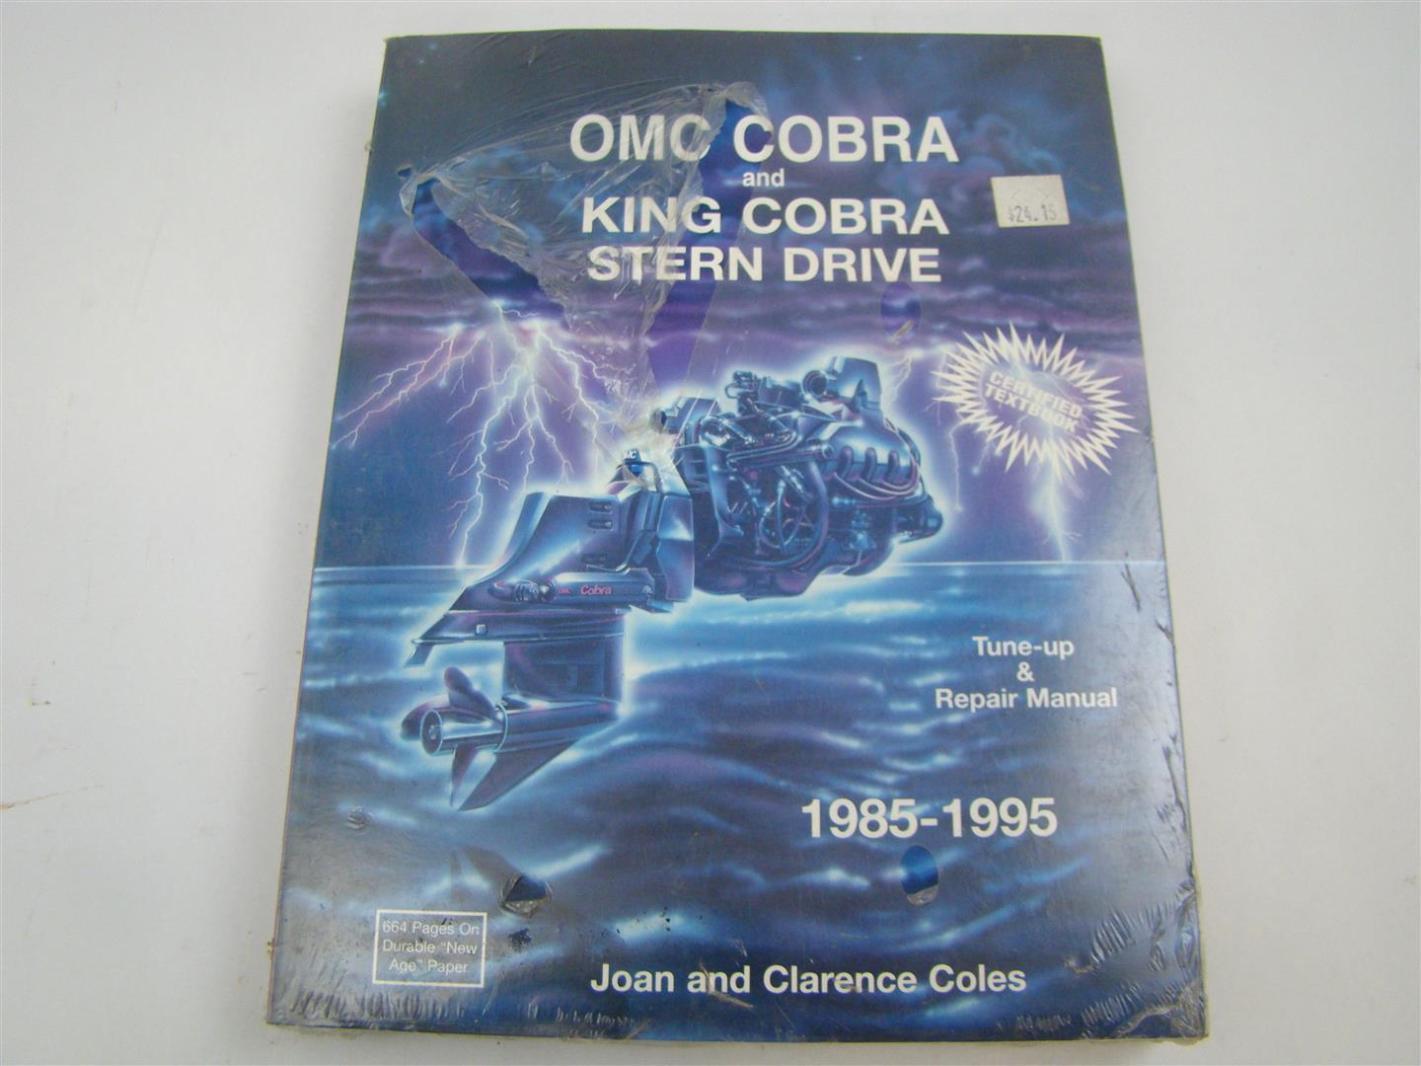 Omc cobra 5 0l manual array seloc omc cobre and king cobra stern drive repair manual 1985 1995 rh ebay fandeluxe Images